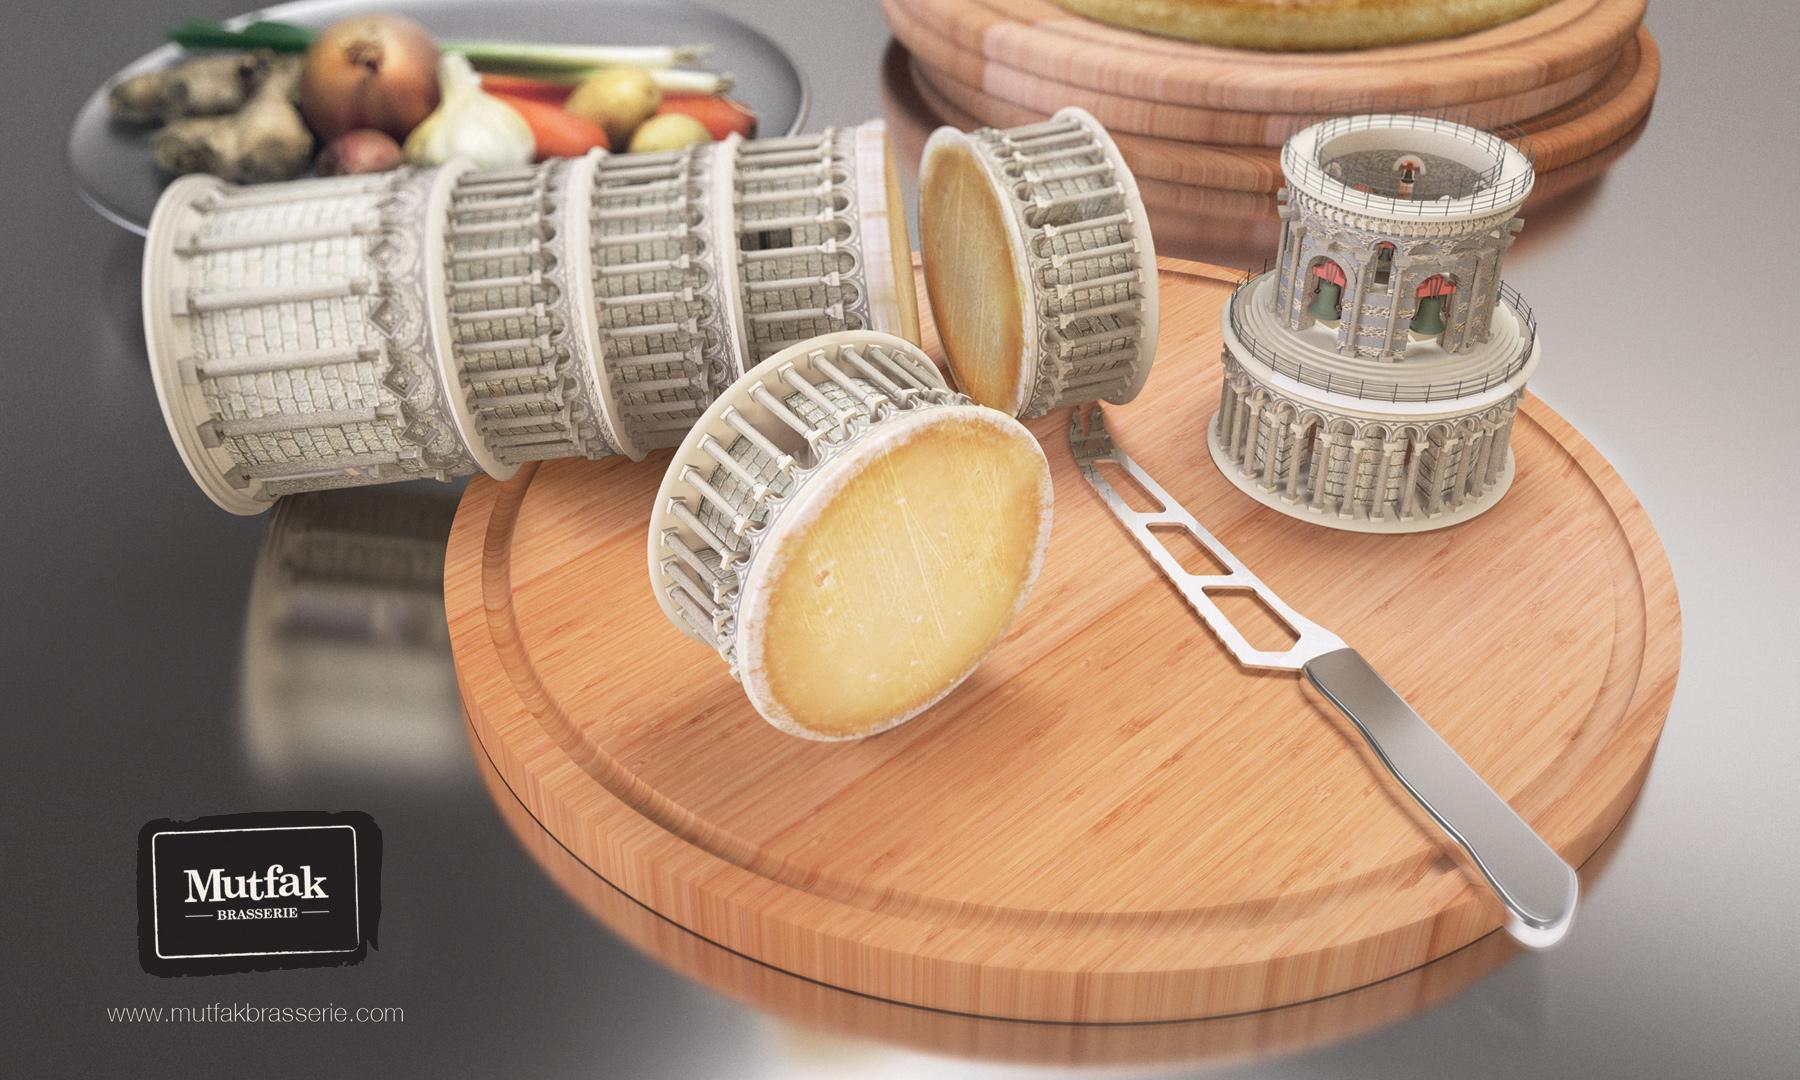 Mutfak Brasserie Print Ad -  World cuisine, Pisa